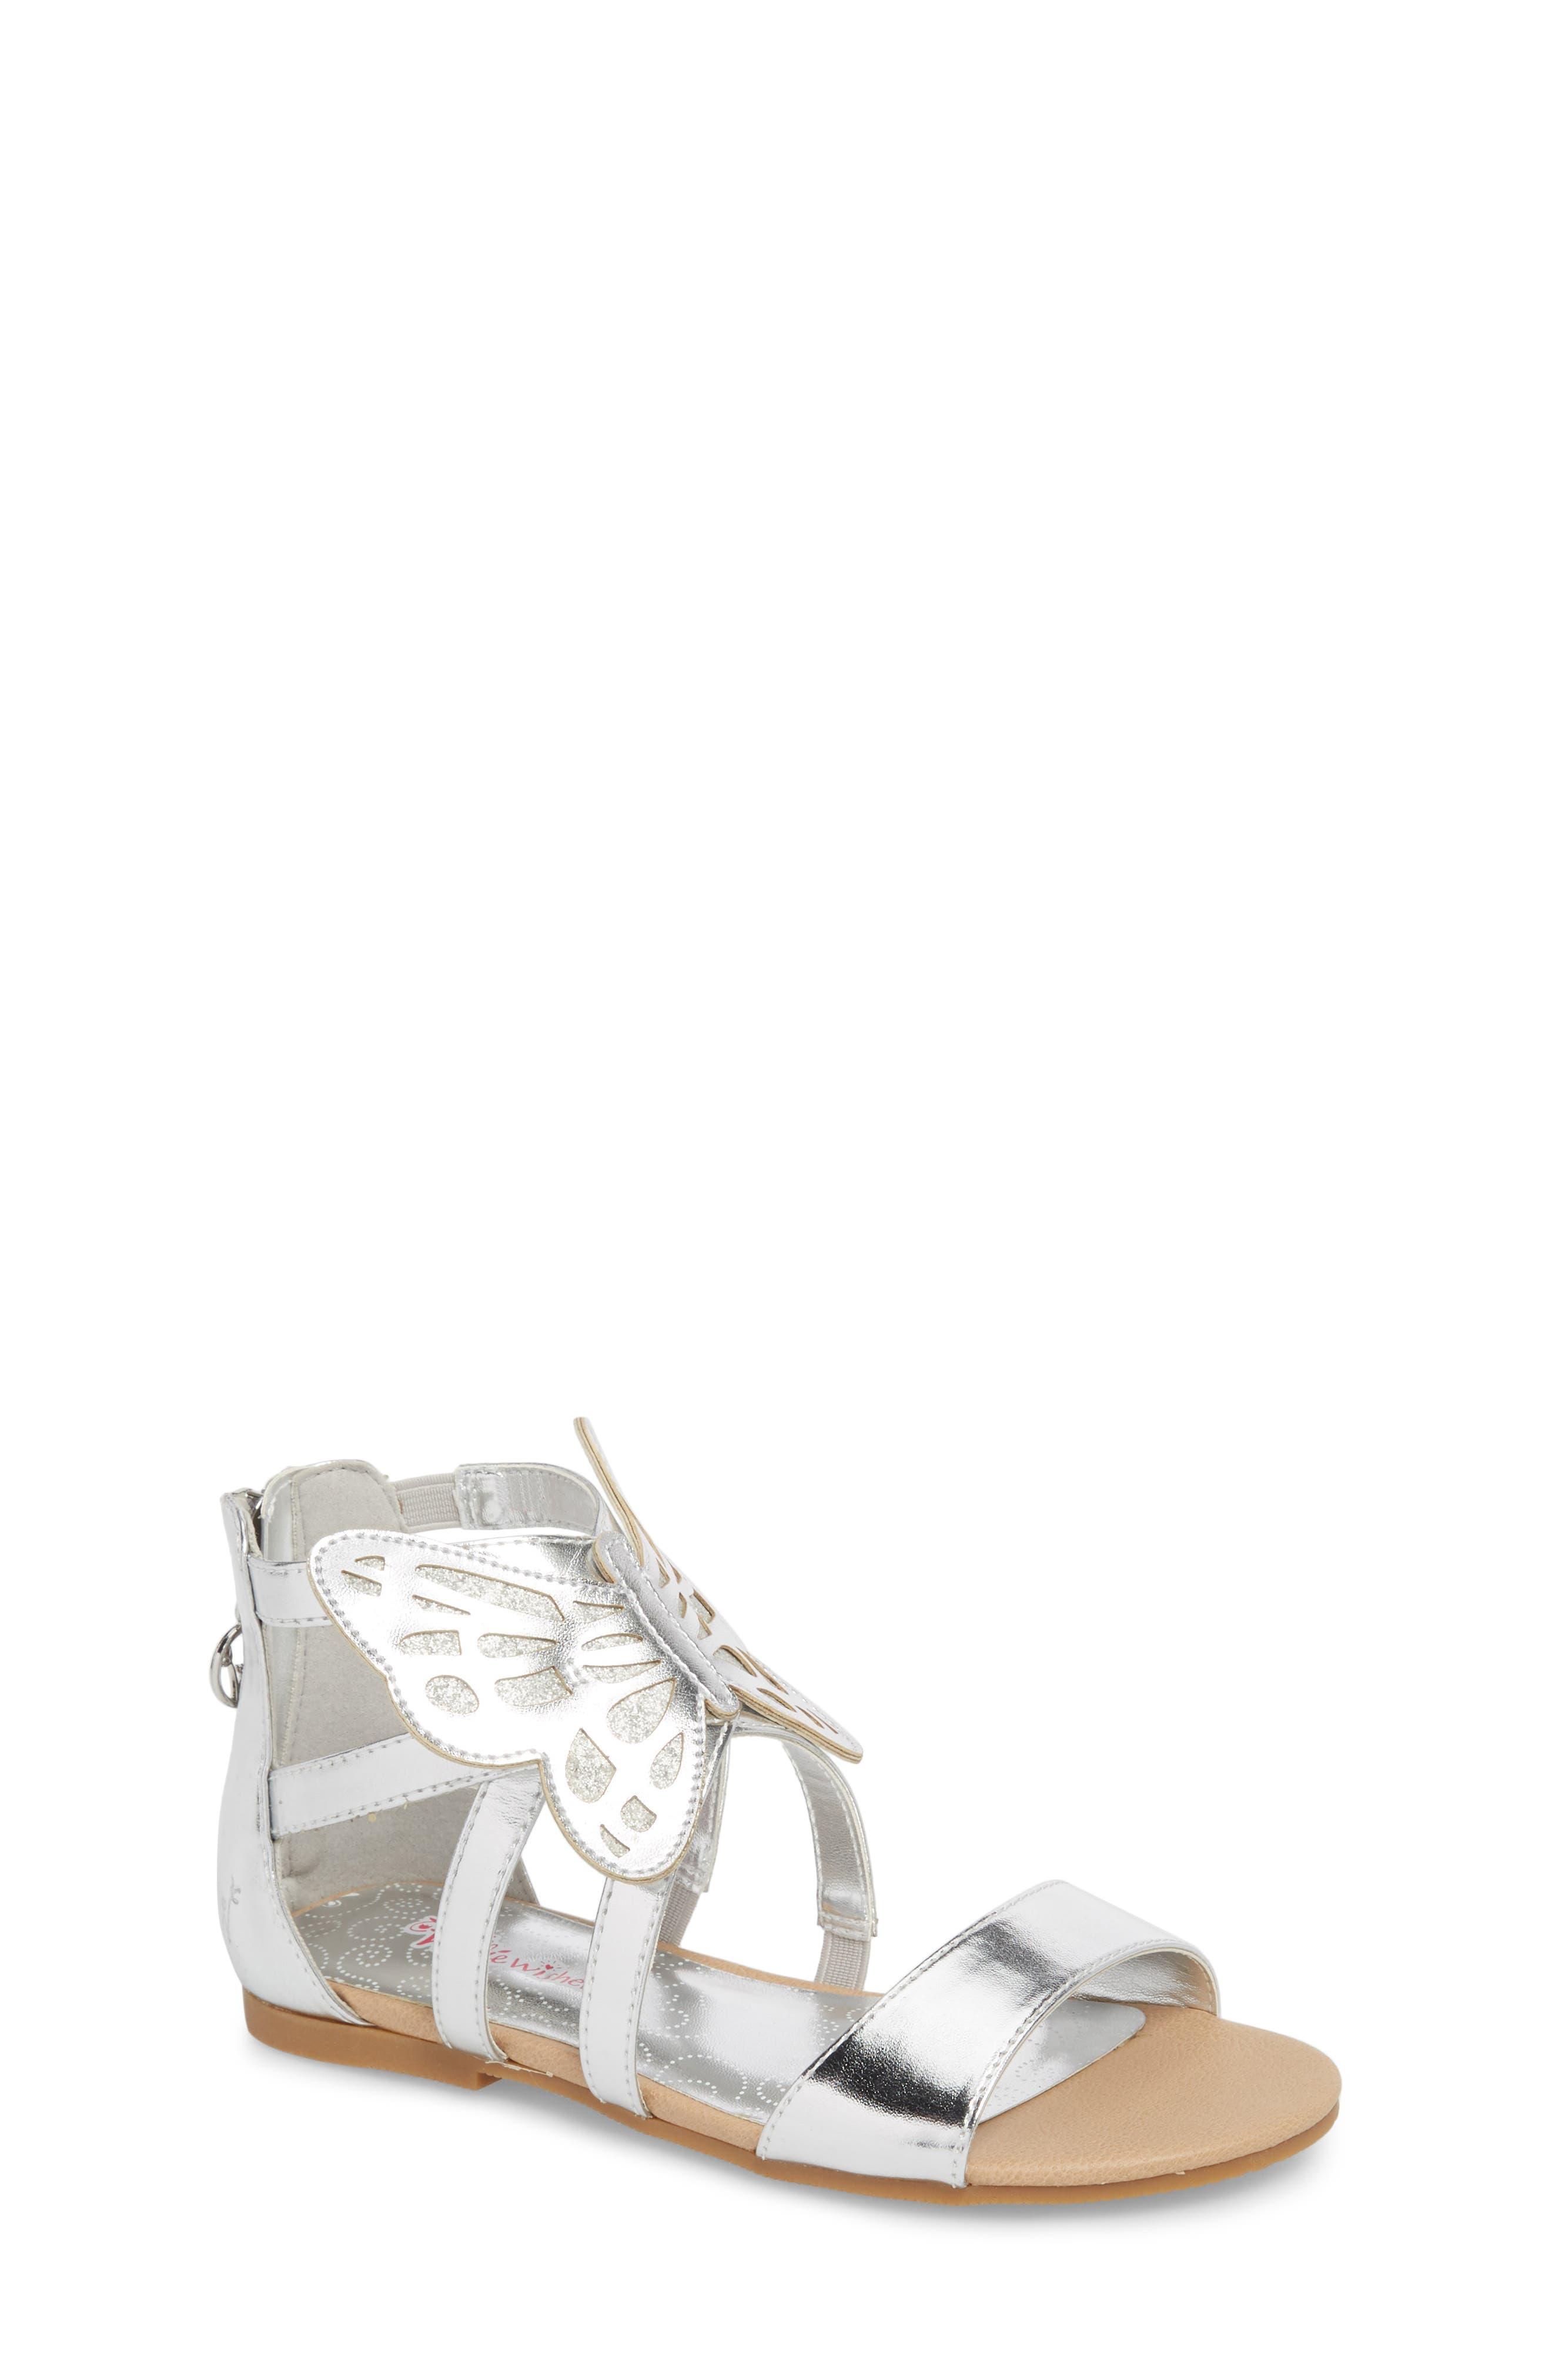 Alternate Image 1 Selected - WellieWishers from American Girl Willa Flutter Metallic Sandal (Walker, Toddler & Little Kid)